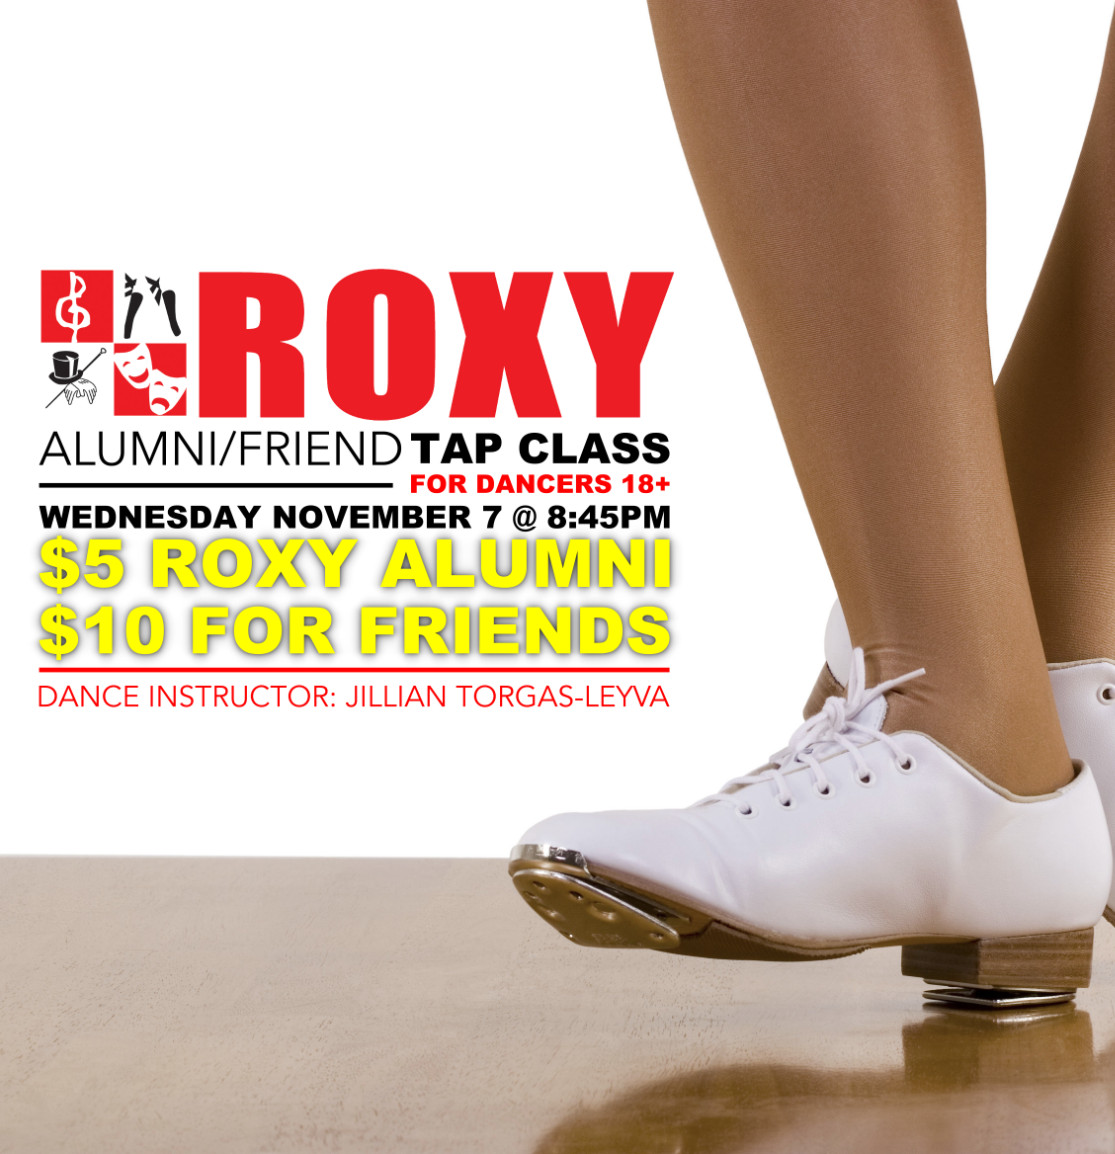 ROXY Alumin/Friend Tap Class